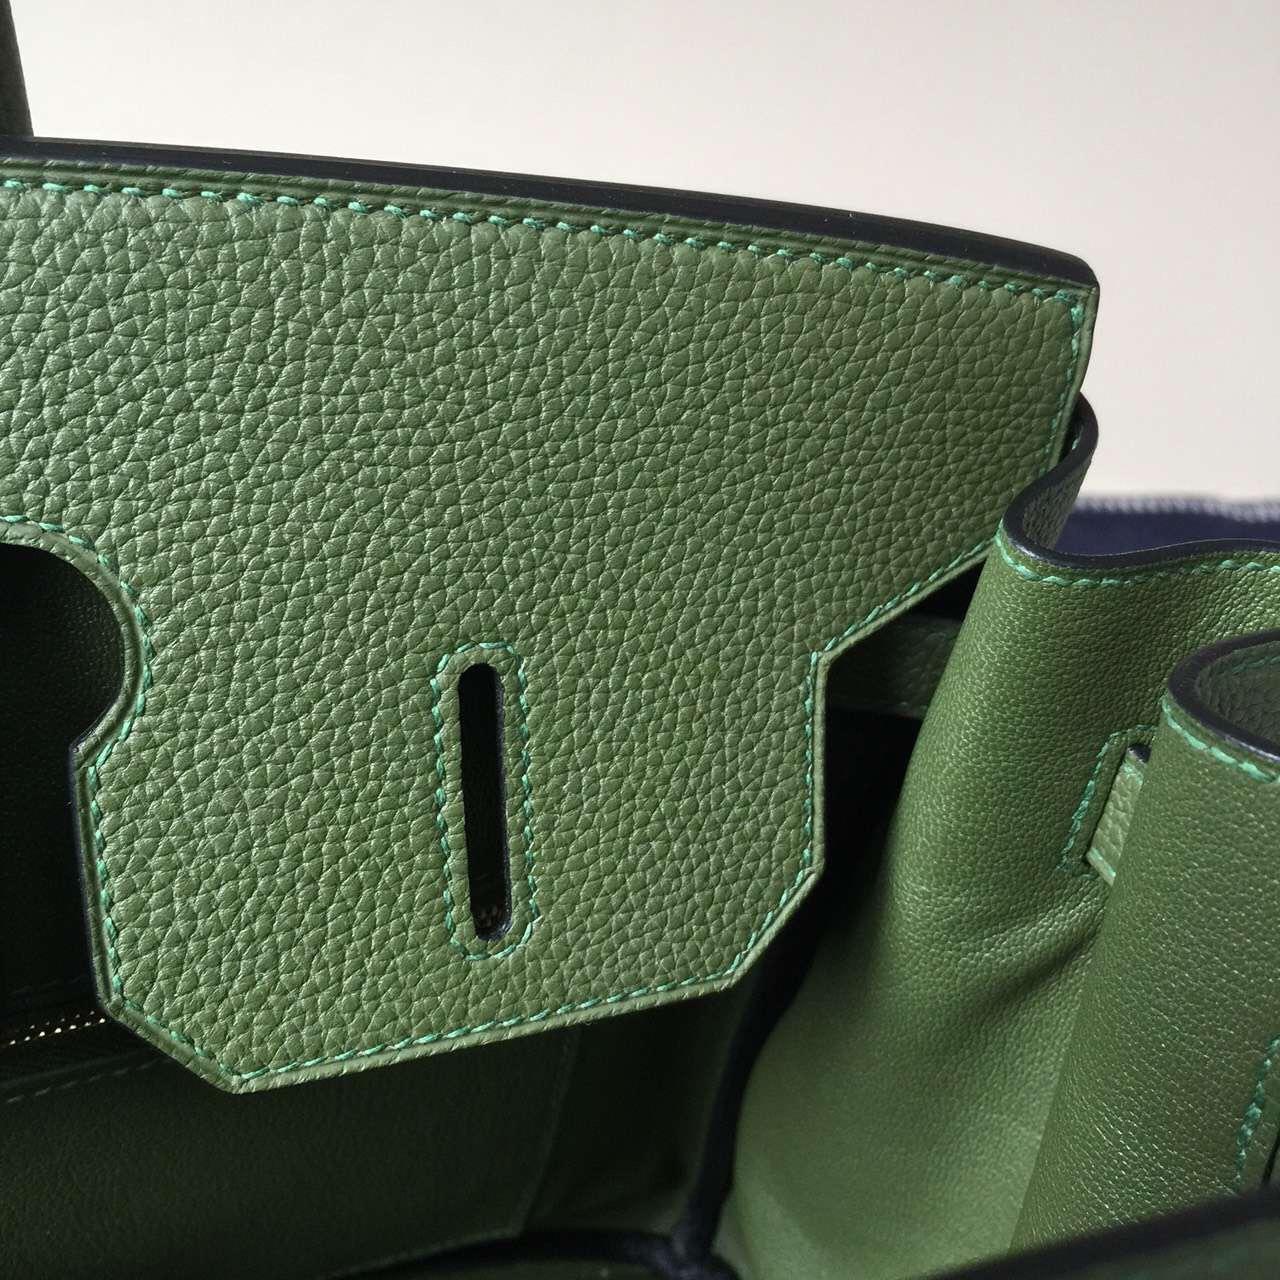 Cheap Hermes V6 Canopee Green Togo Calf Leather Birkin Bag 35cm